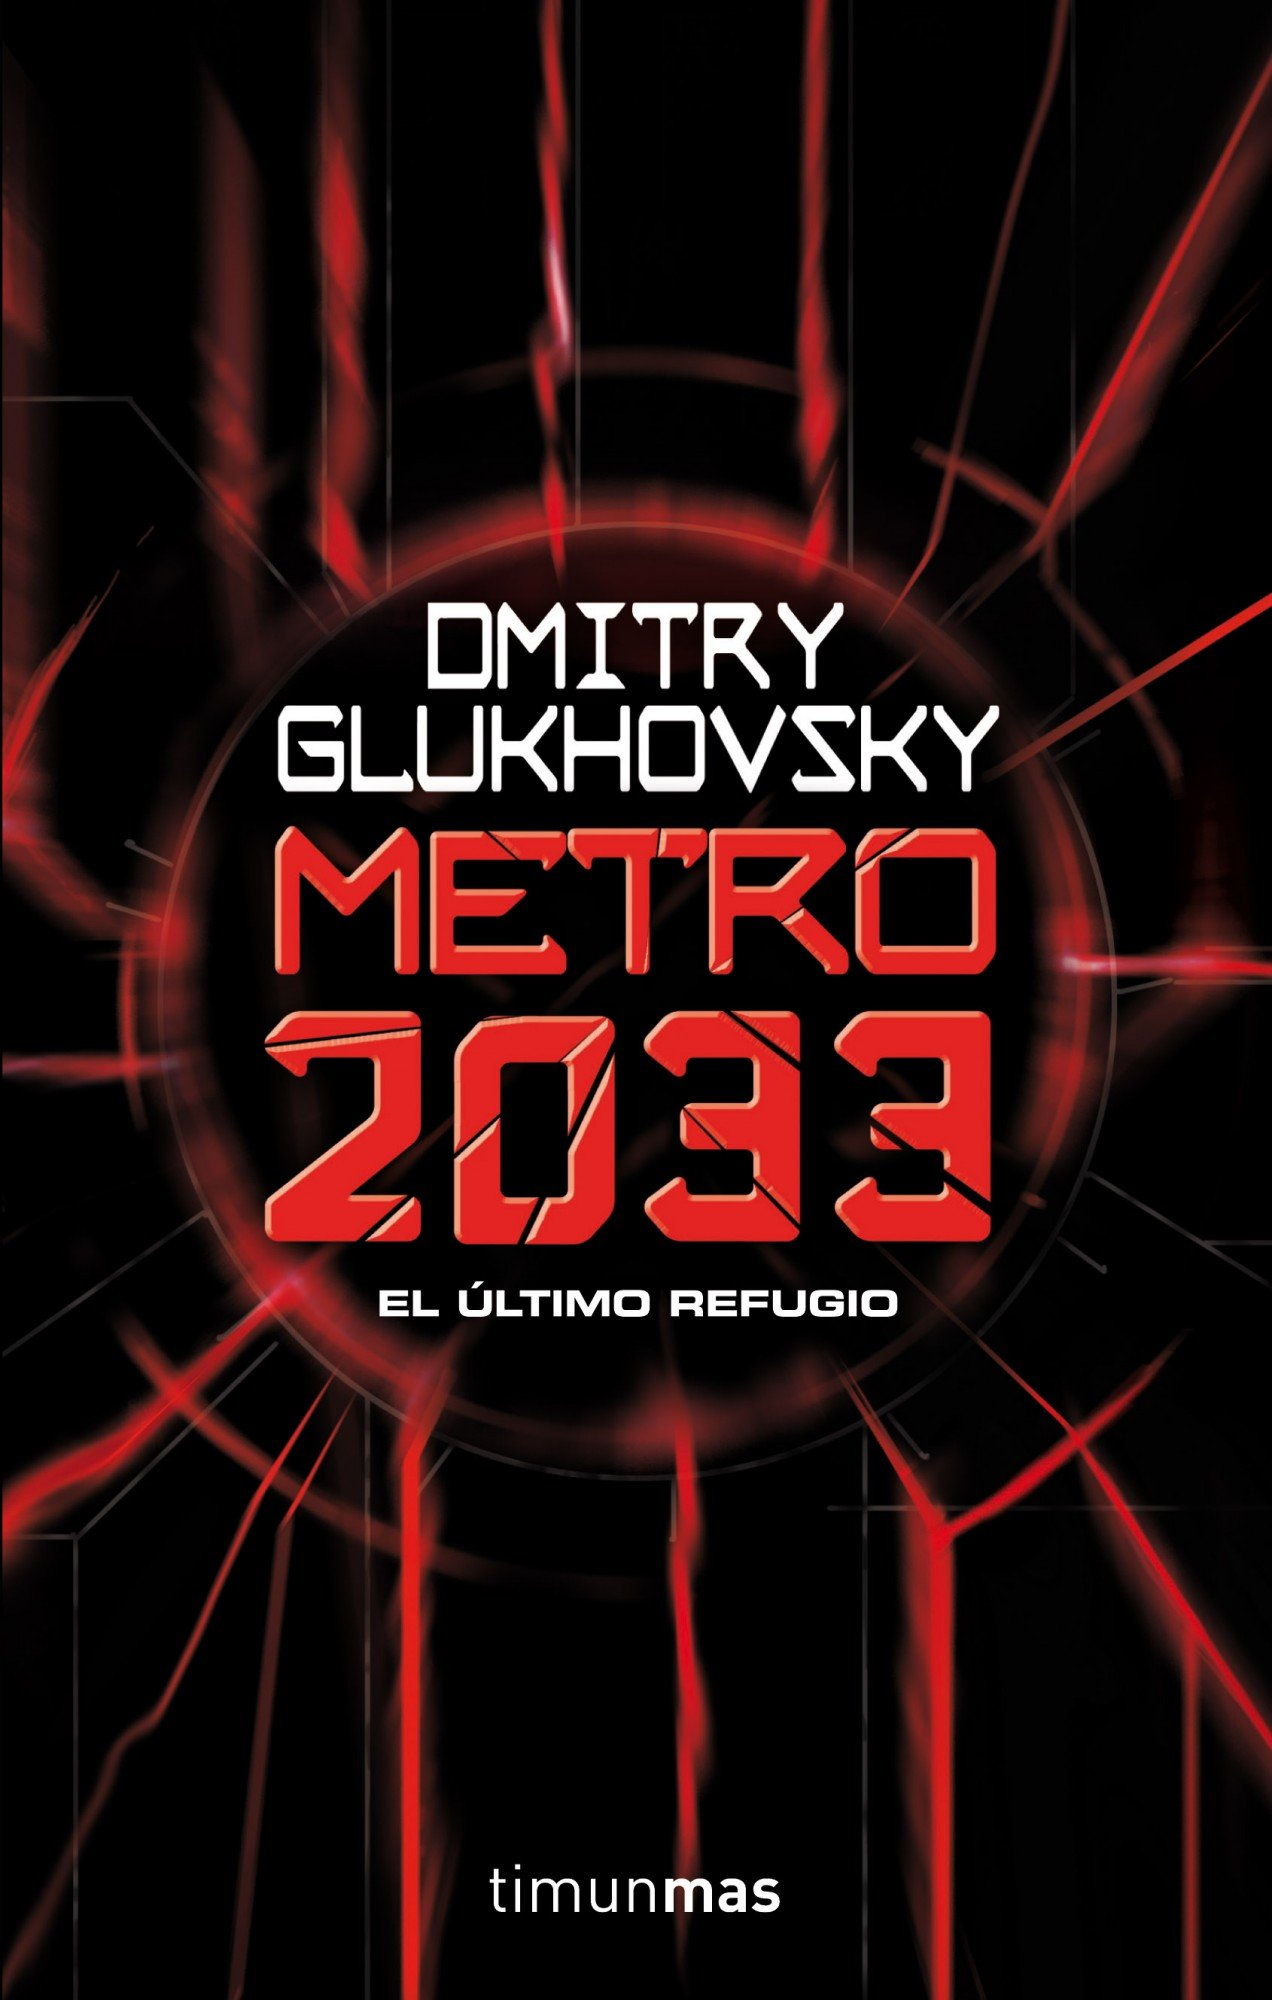 Metro 2033 (Universo Metro) Tapa blanda – 6 mar 2012 Dmitry Glukhovsky Joan Josep Mussarra Roca Timun Mas Narrativa 8448005007